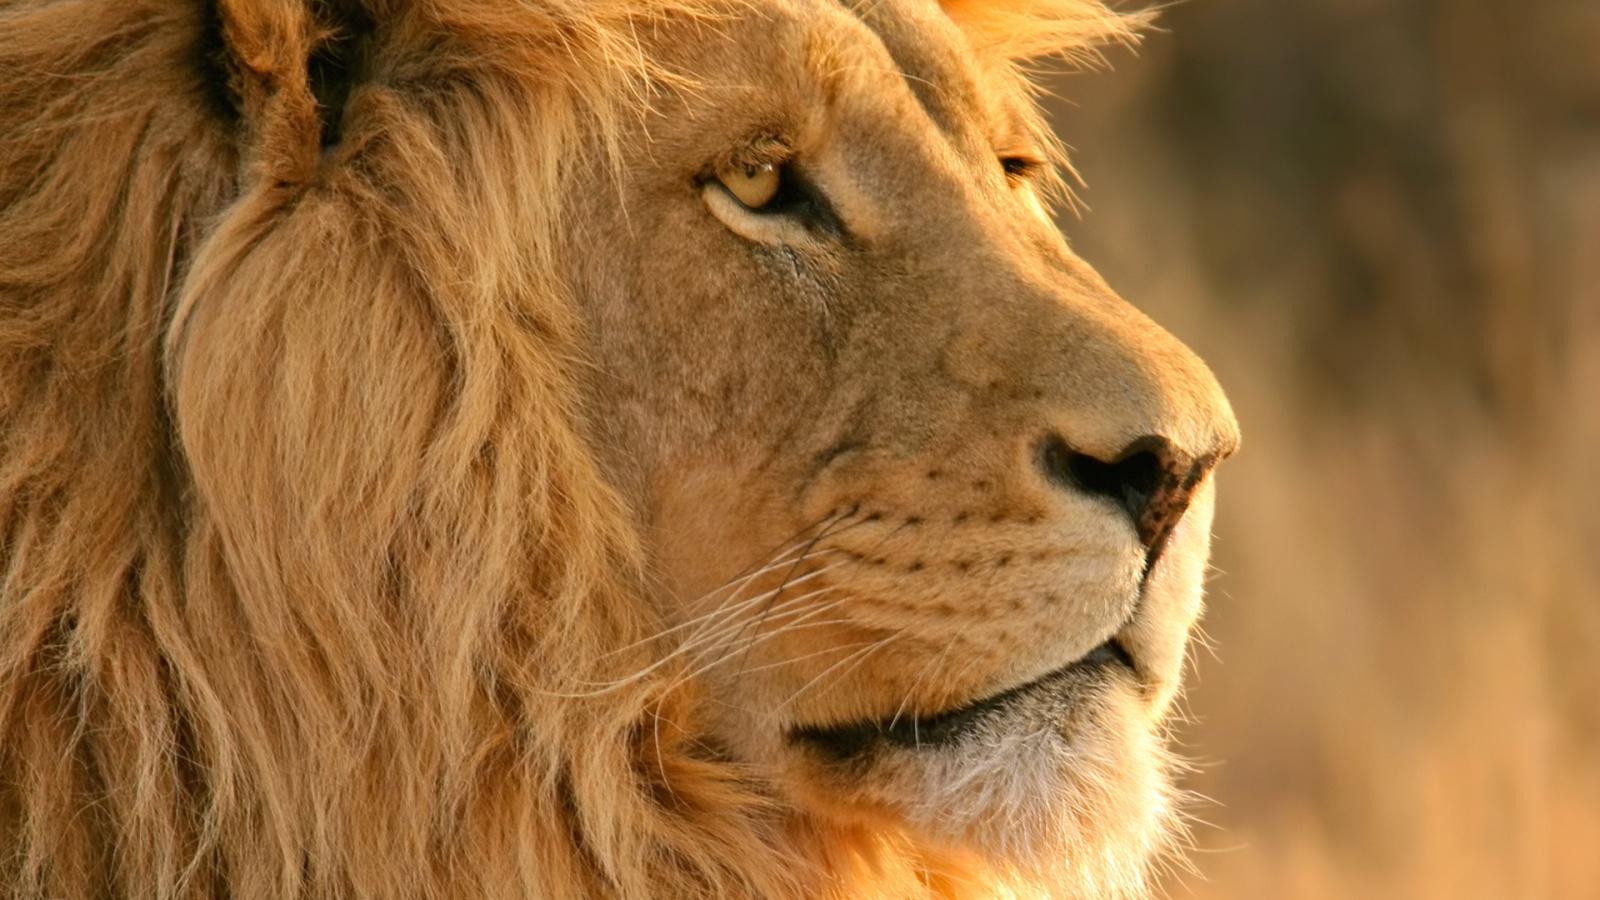 http://1.bp.blogspot.com/-Wi2LAowhi9c/ULjjg3Rot5I/AAAAAAAAAbk/R6ELe-xRUys/s1600/lion-face-1600x900.jpg